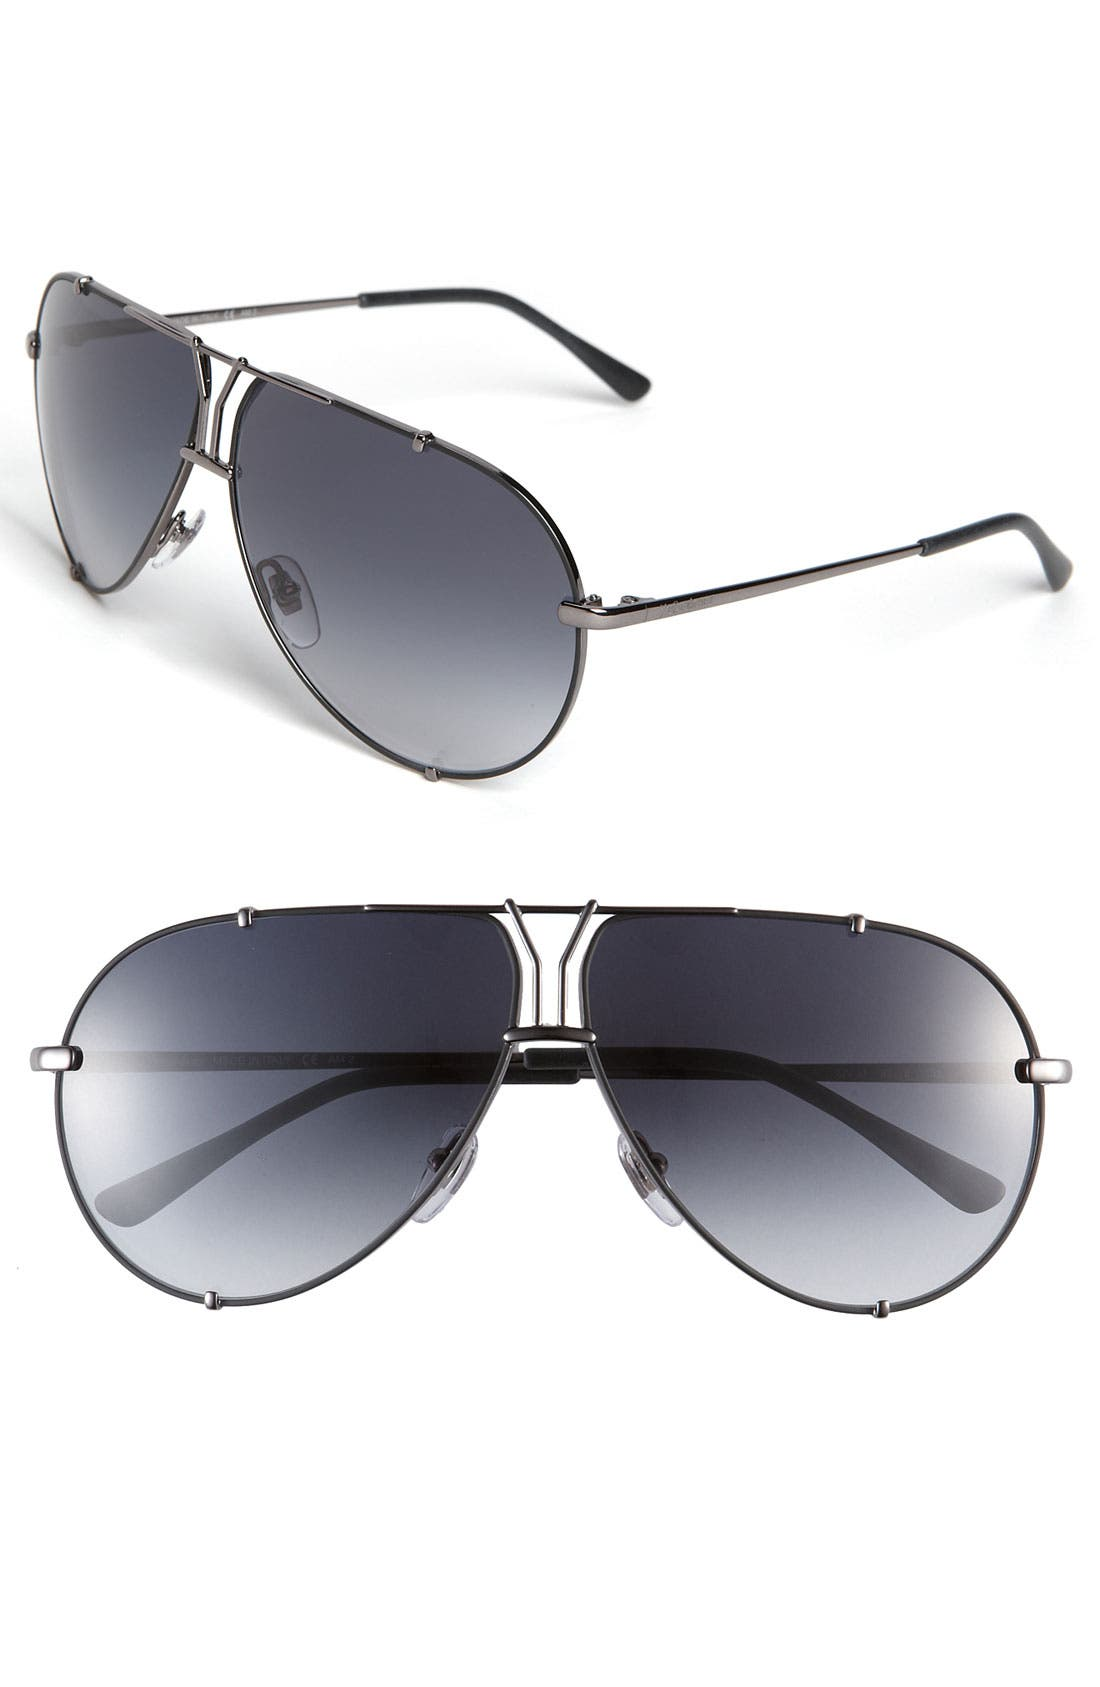 Main Image - Yves Saint Laurent Metal Aviator Sunglasses